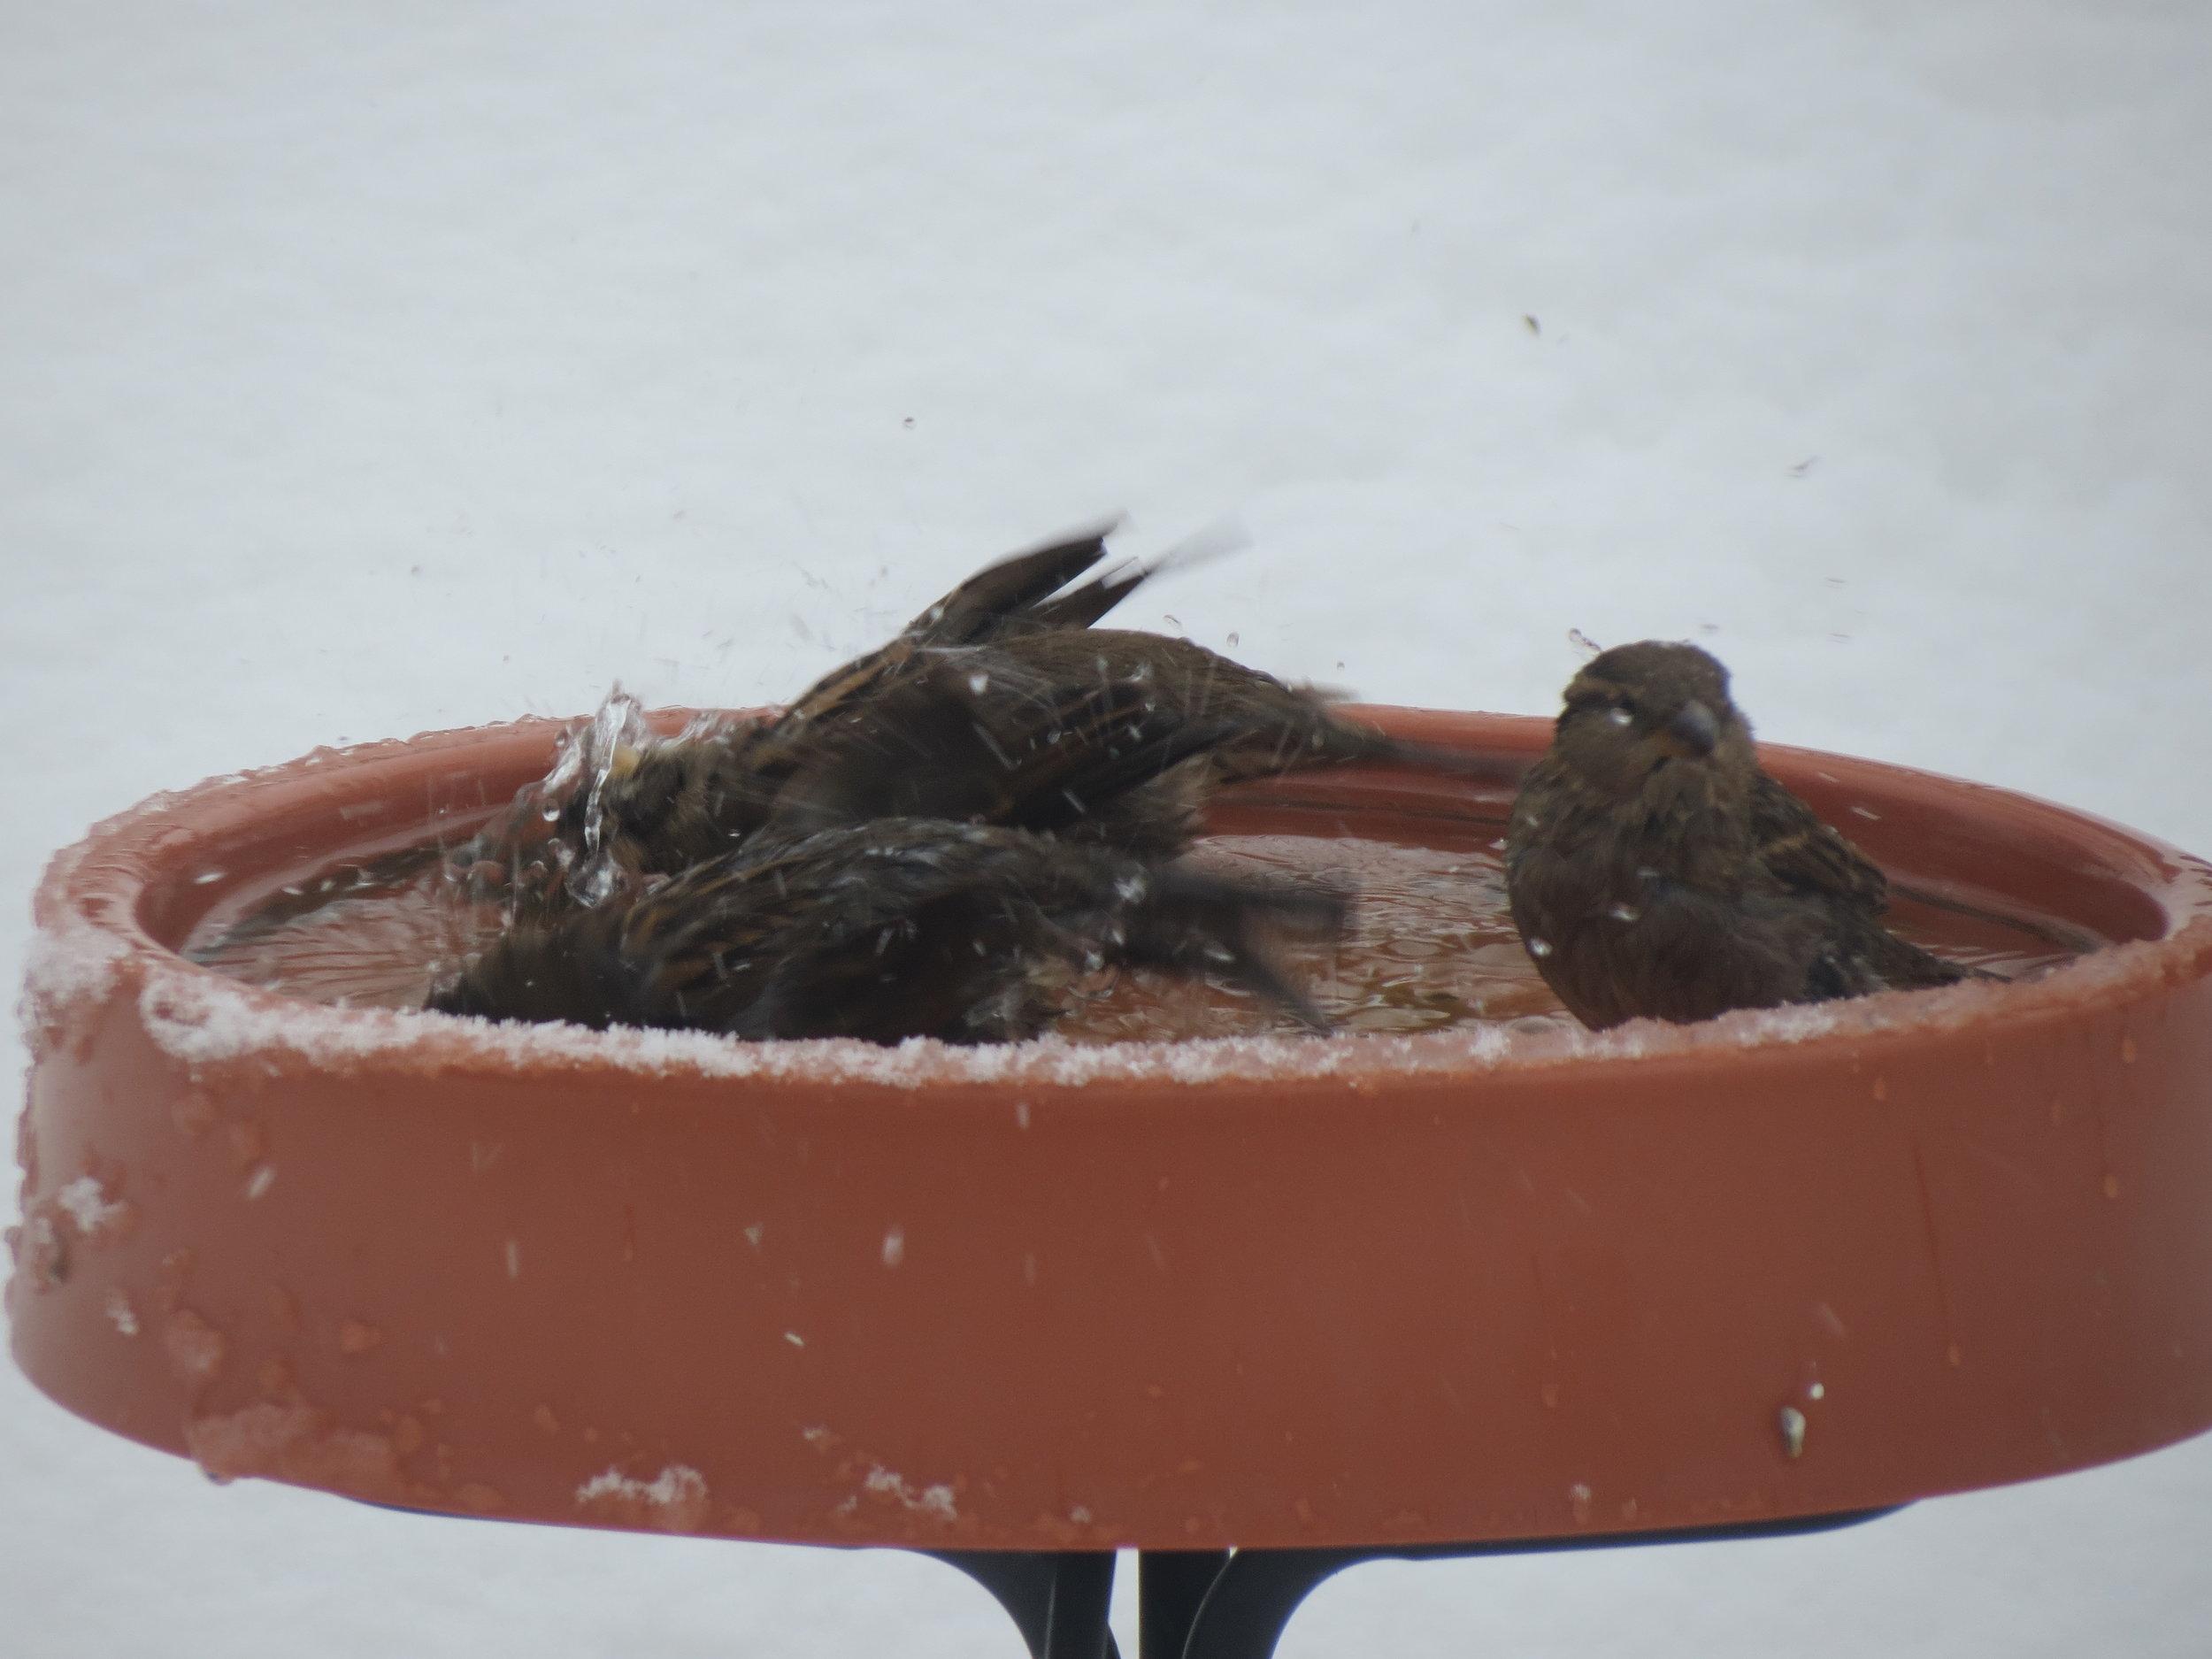 Heated Birdbath in our Garden!